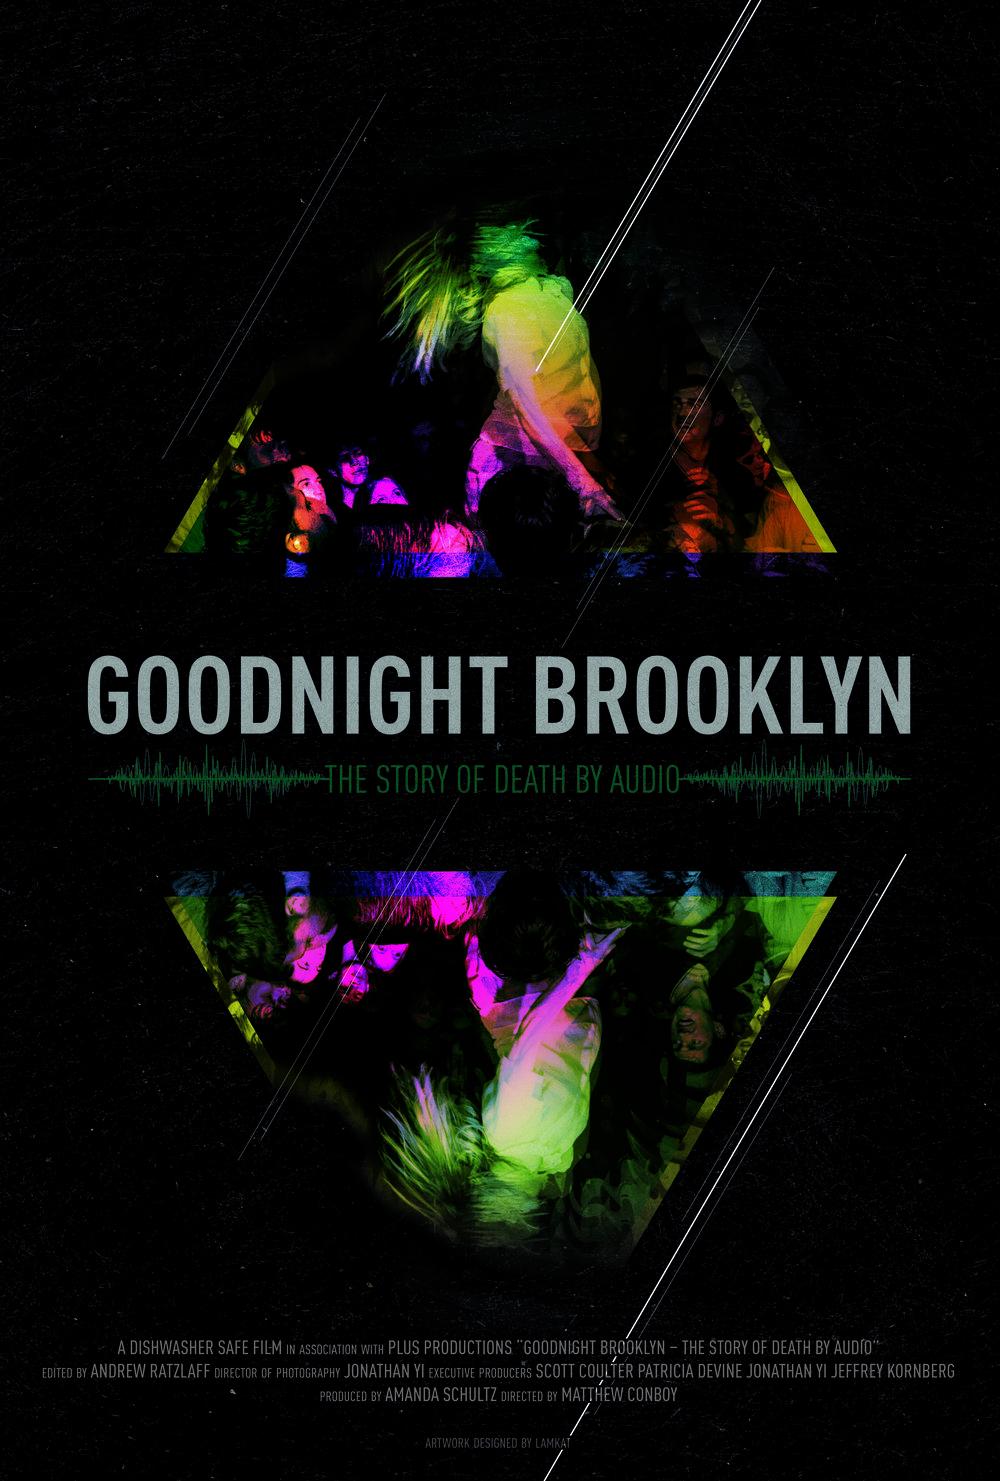 Goodnight_Brooklyn_Poster (1).jpg